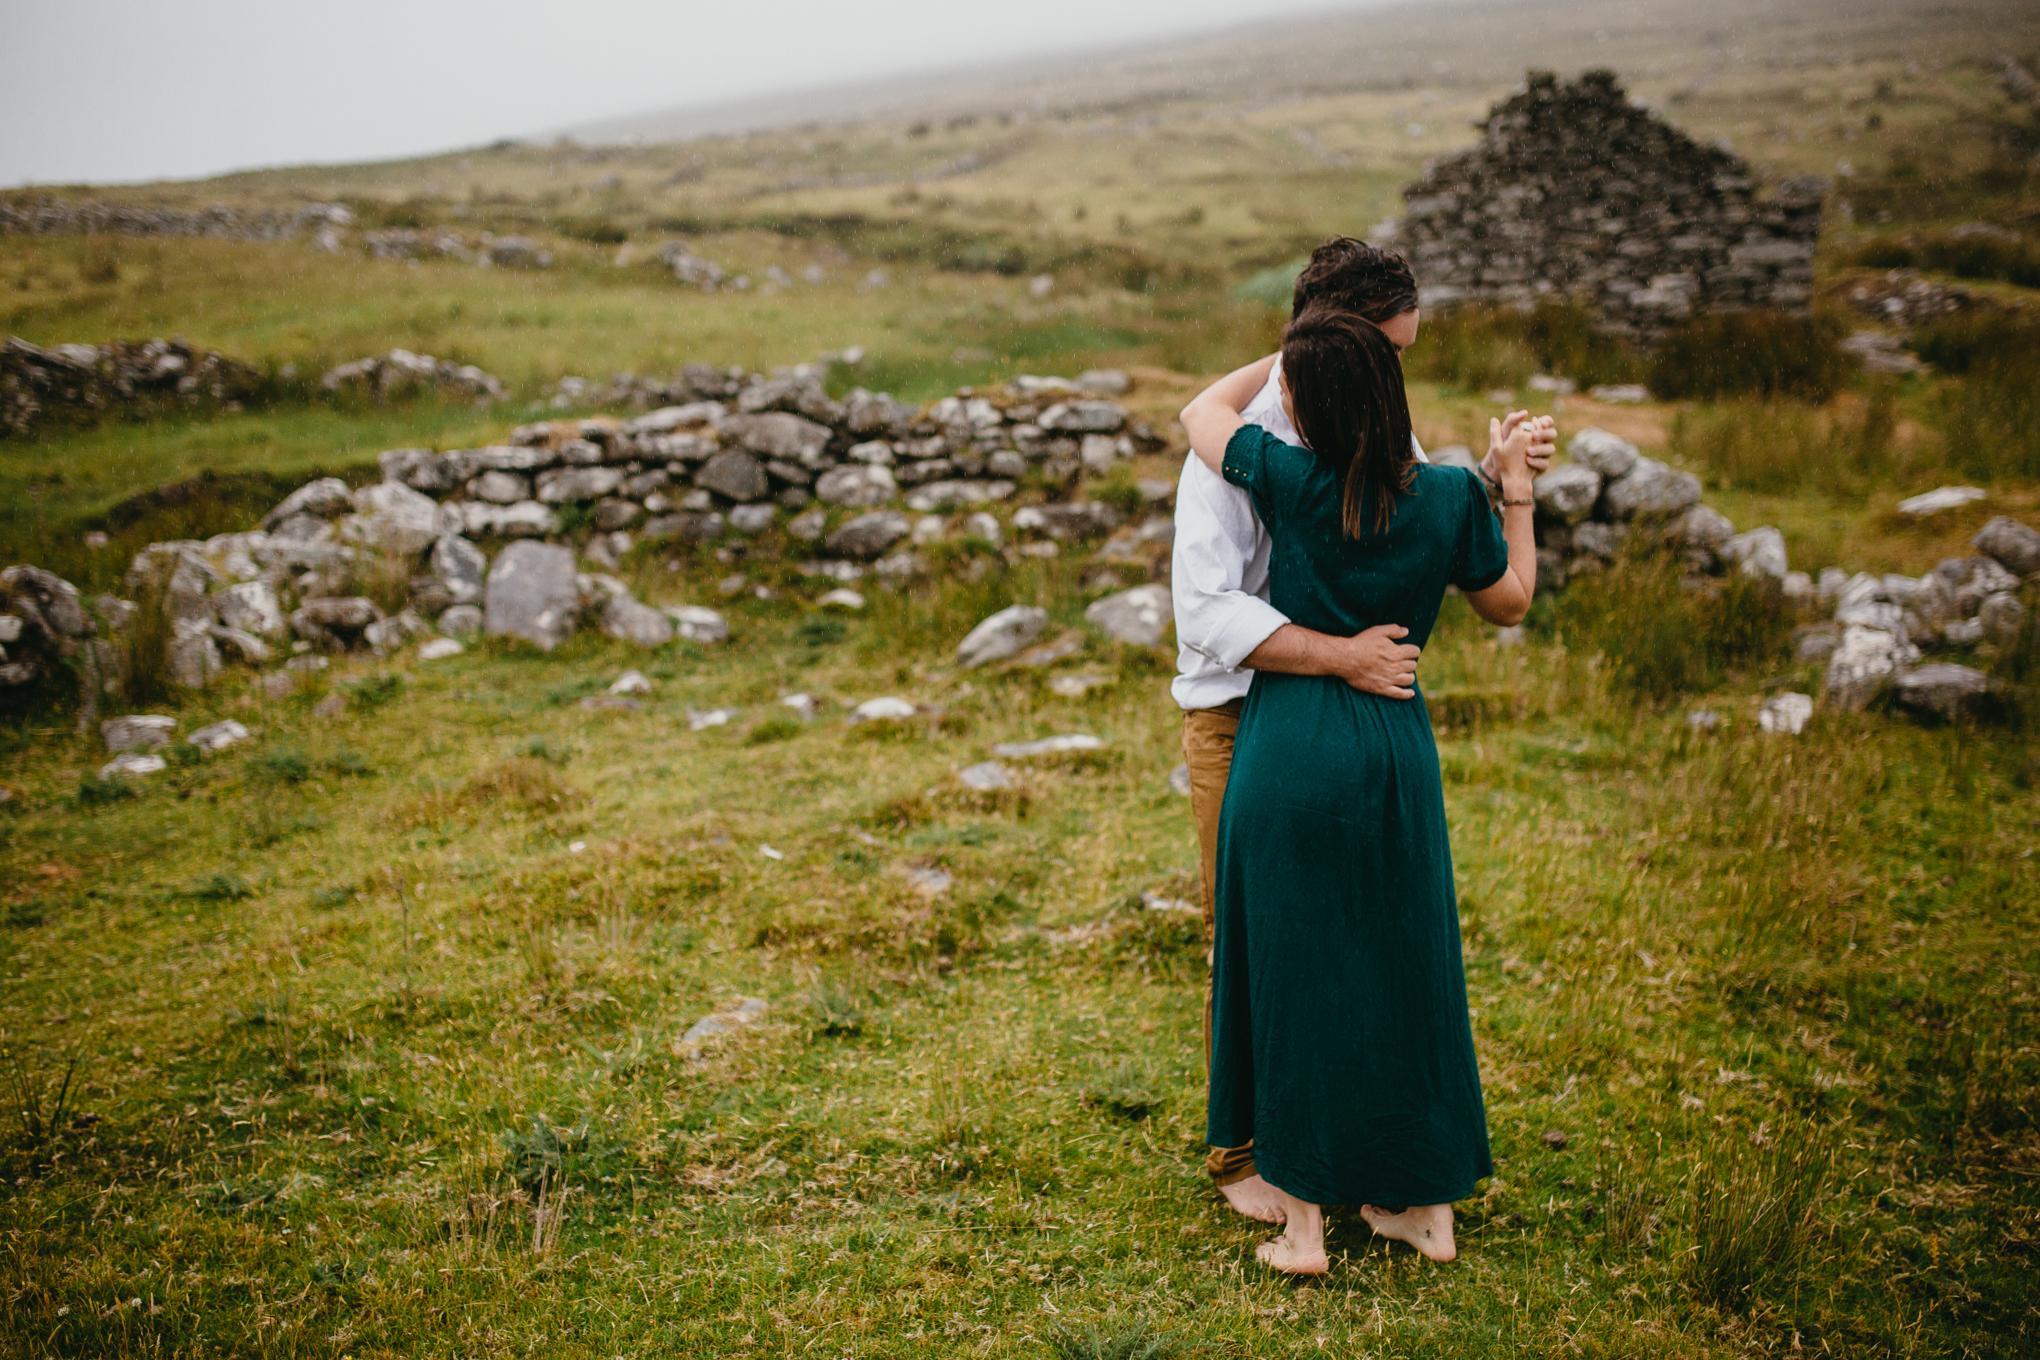 rowan+birch-ireland-anniversary-photos-30.jpg